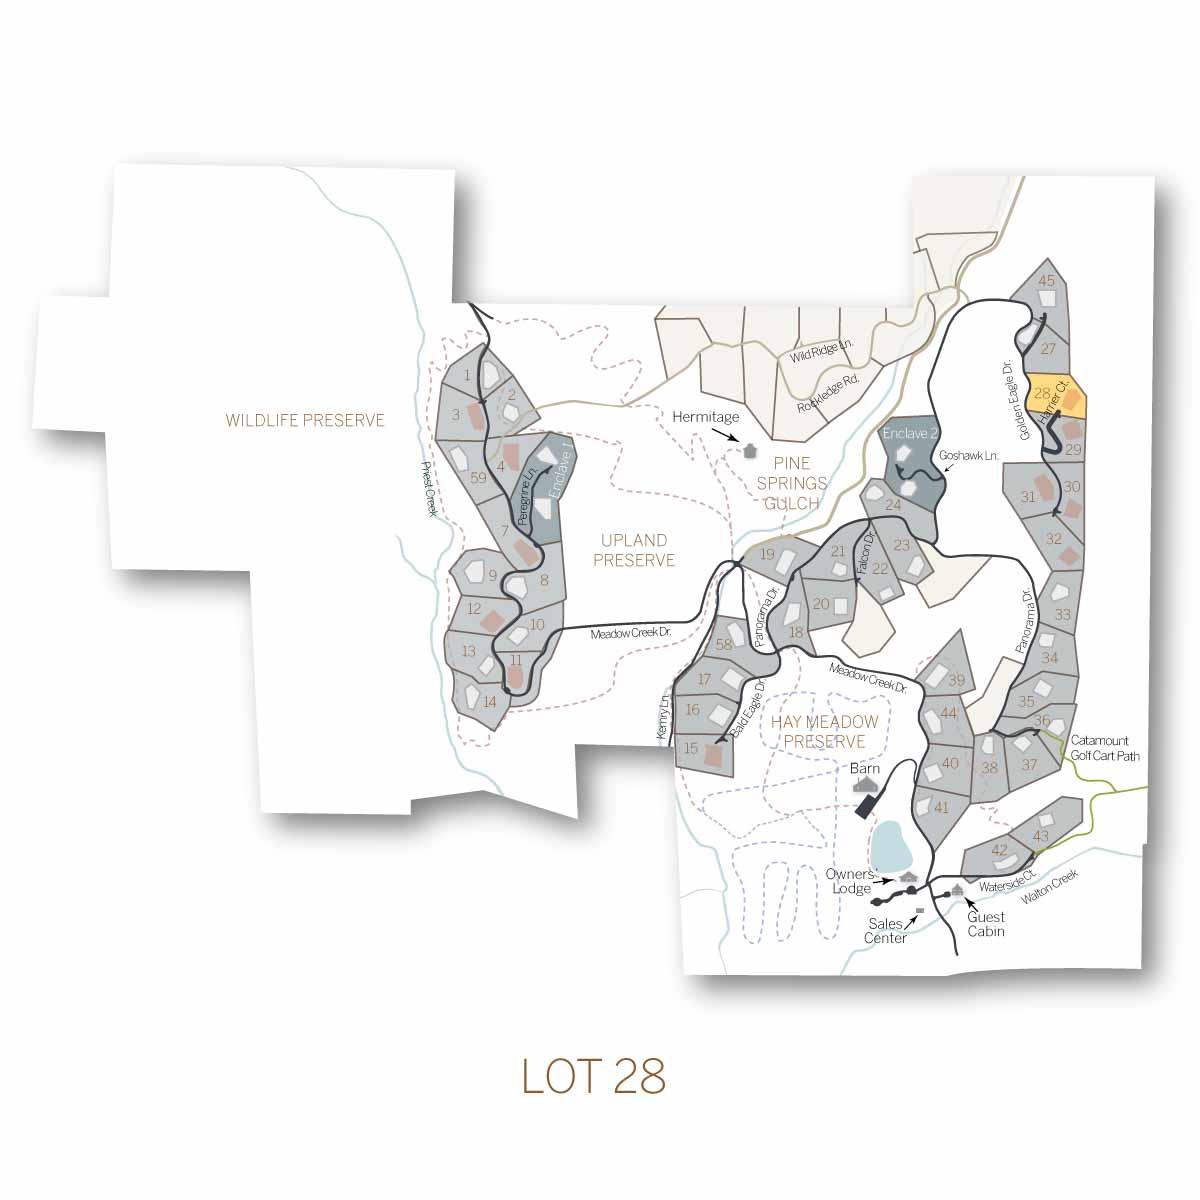 lot 28 1 - Homesite #28